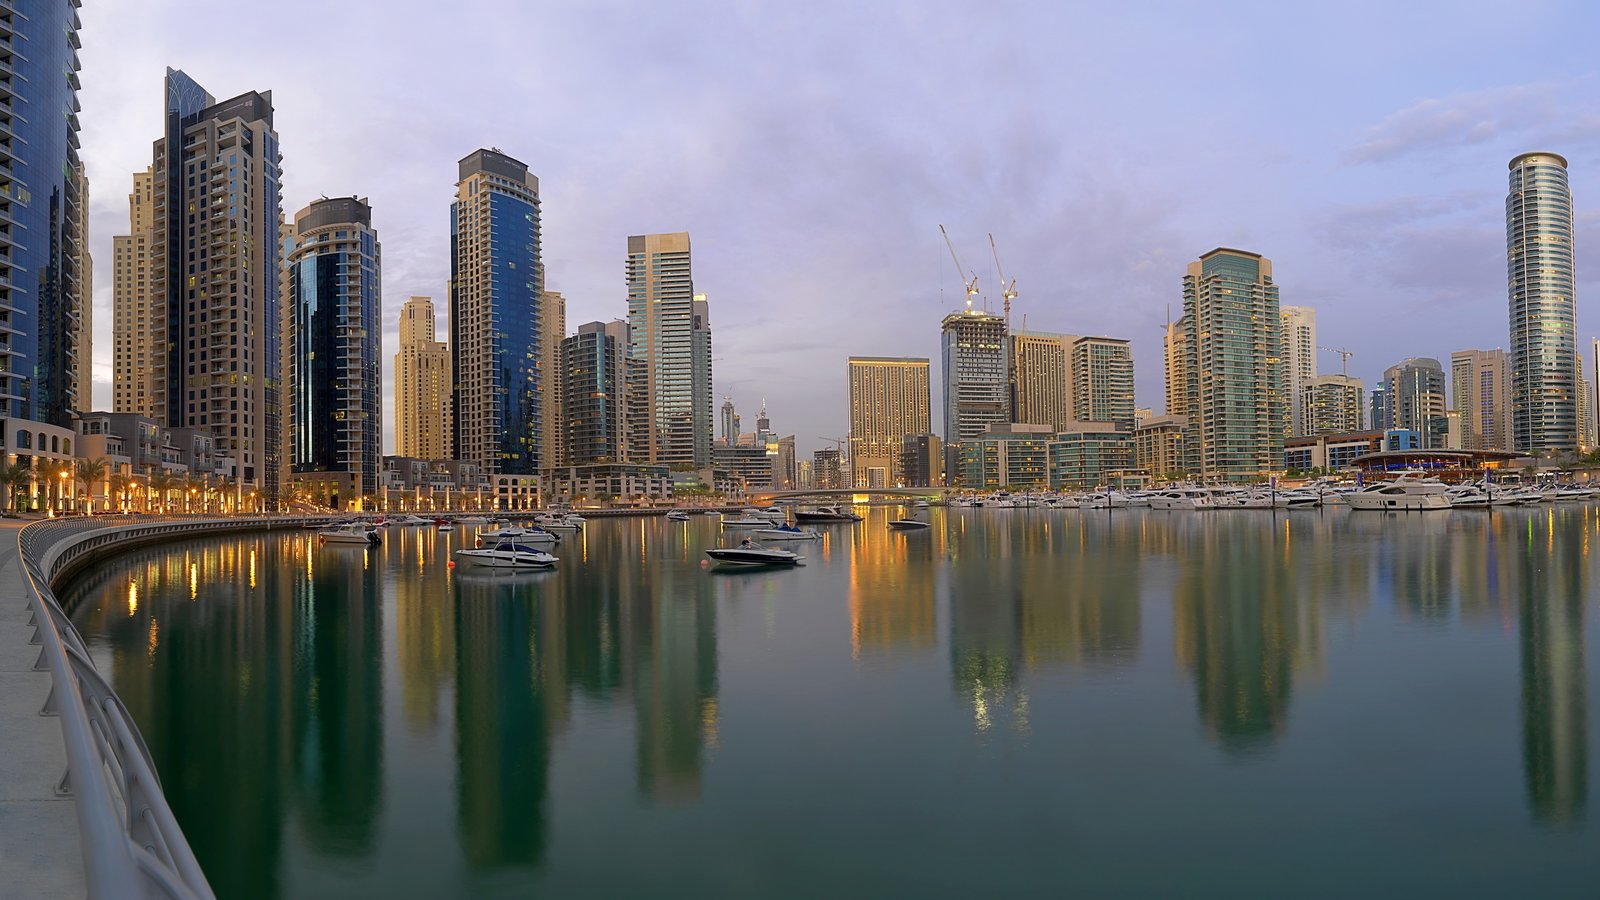 Dubai Marina featuring boating, general coastal views and skyline